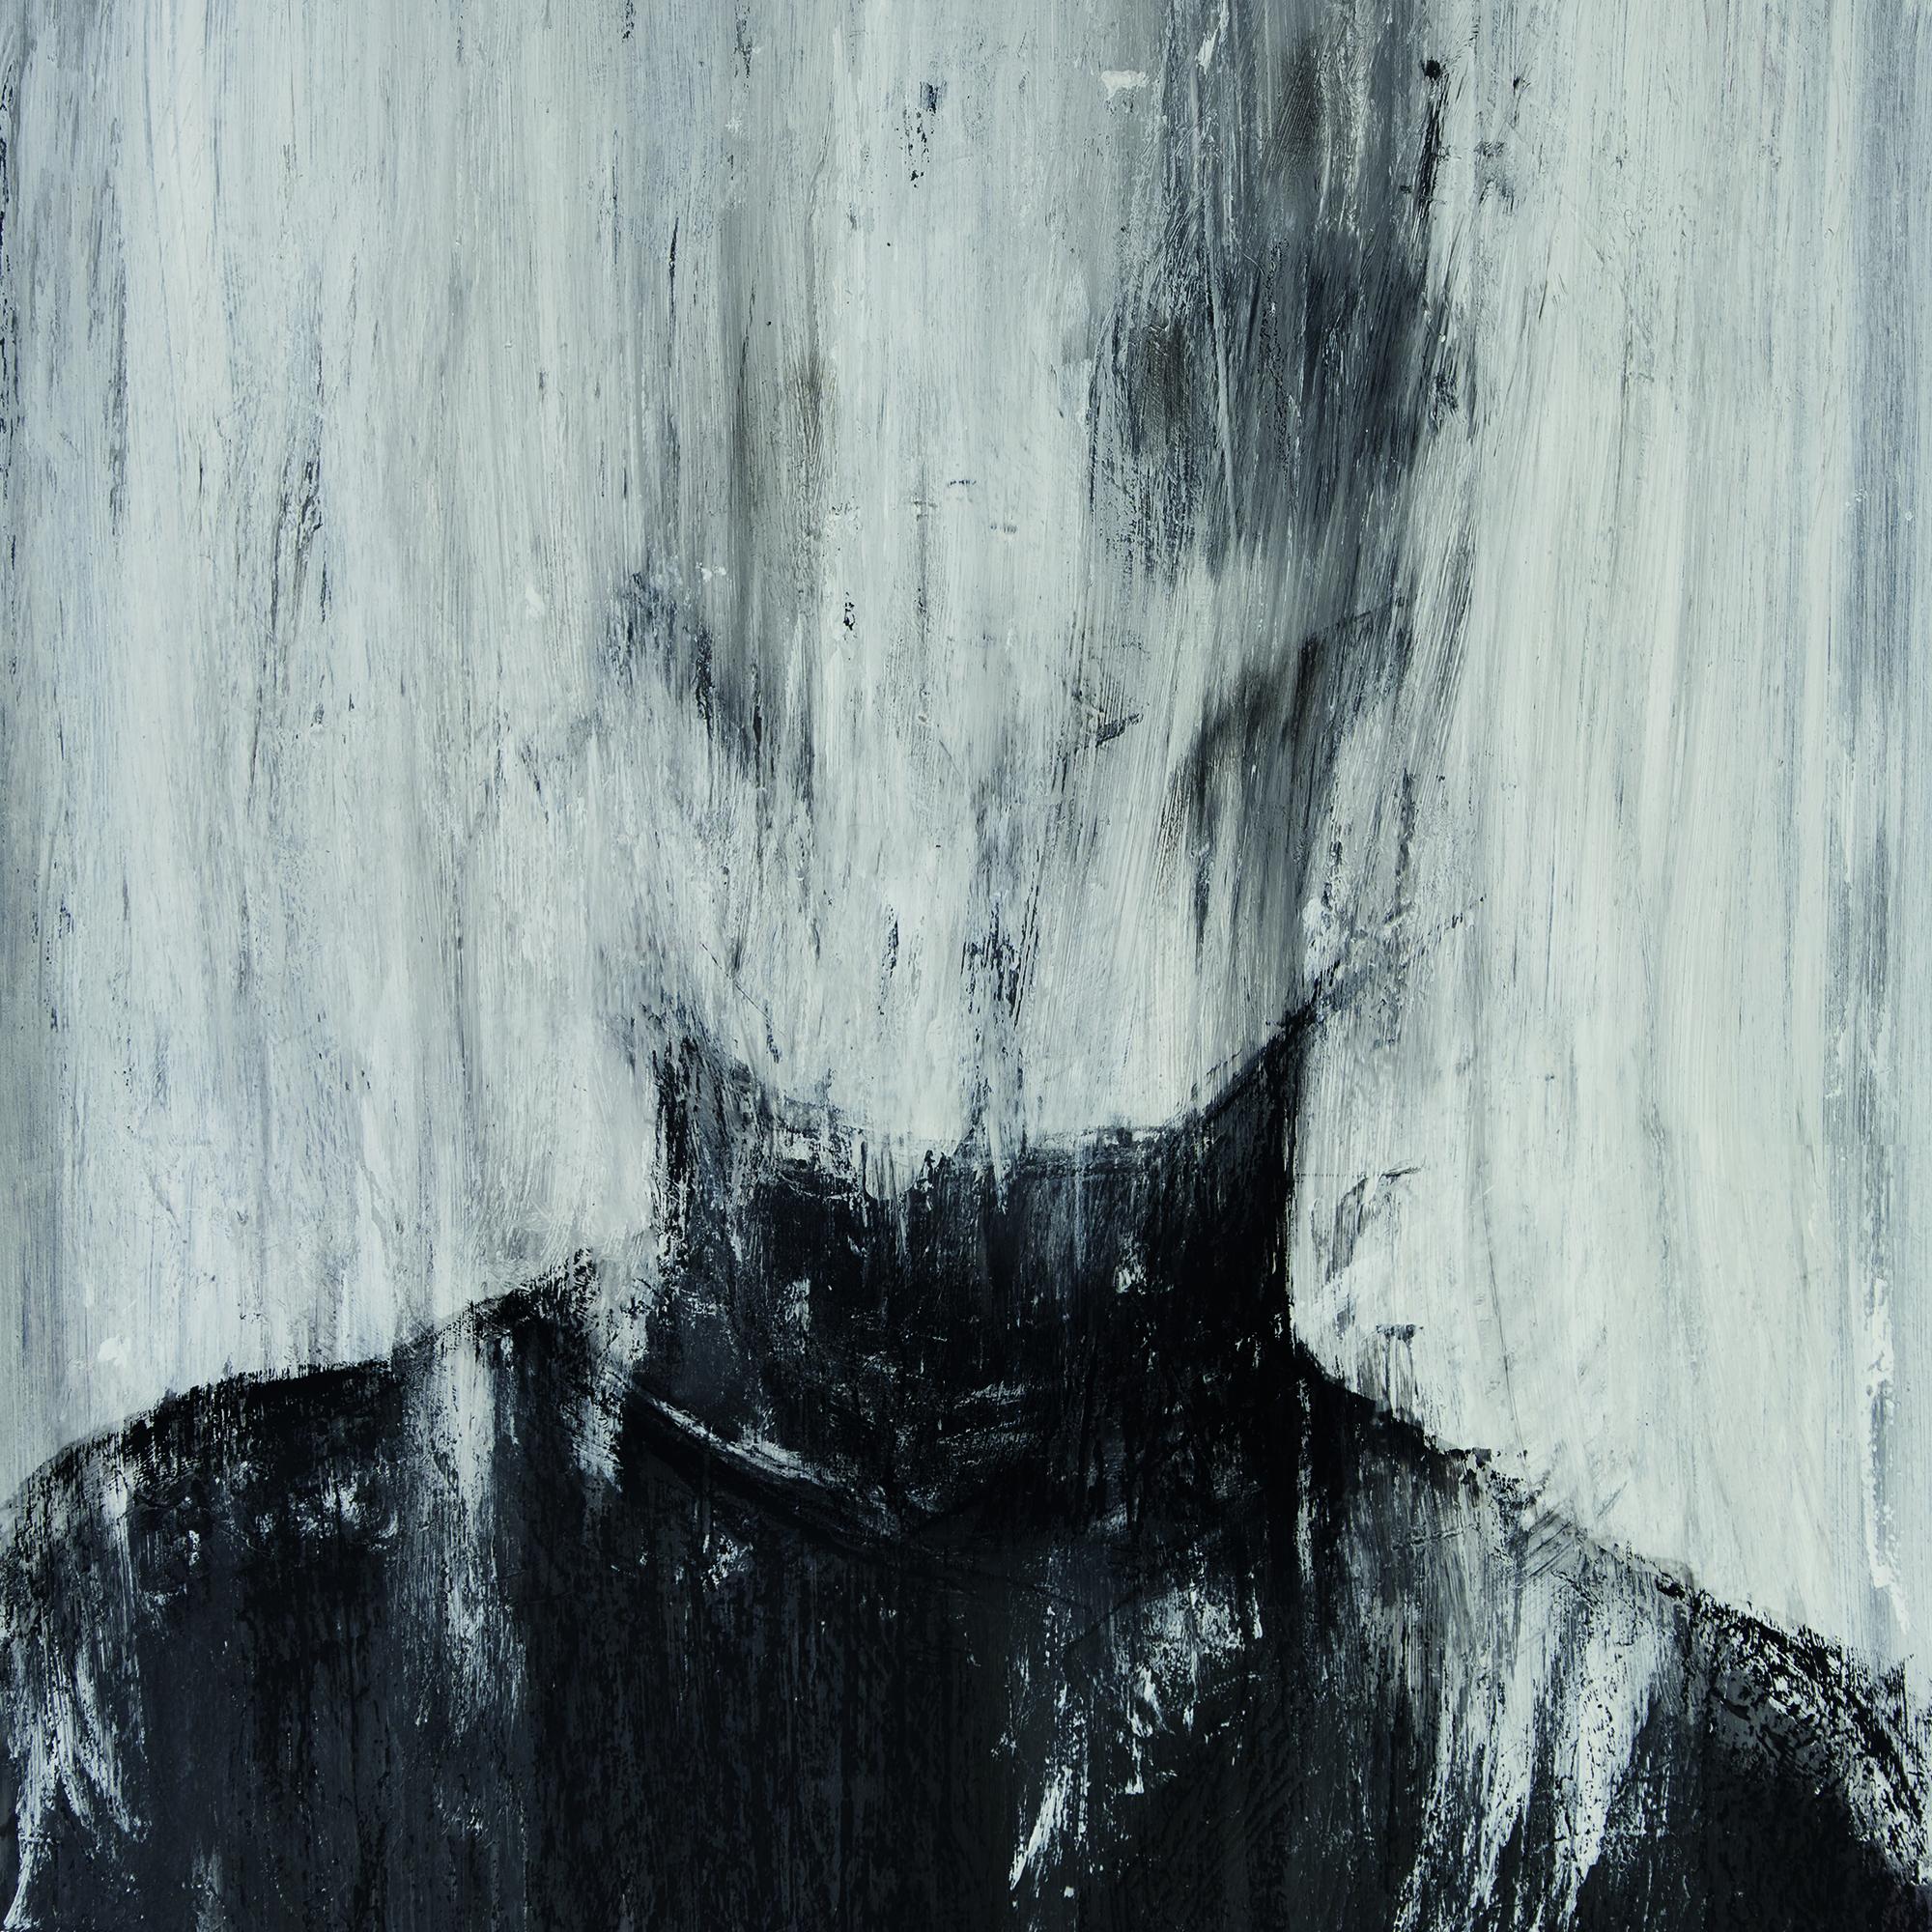 Sept - Challenge EP (Voxnox Records, 2018)